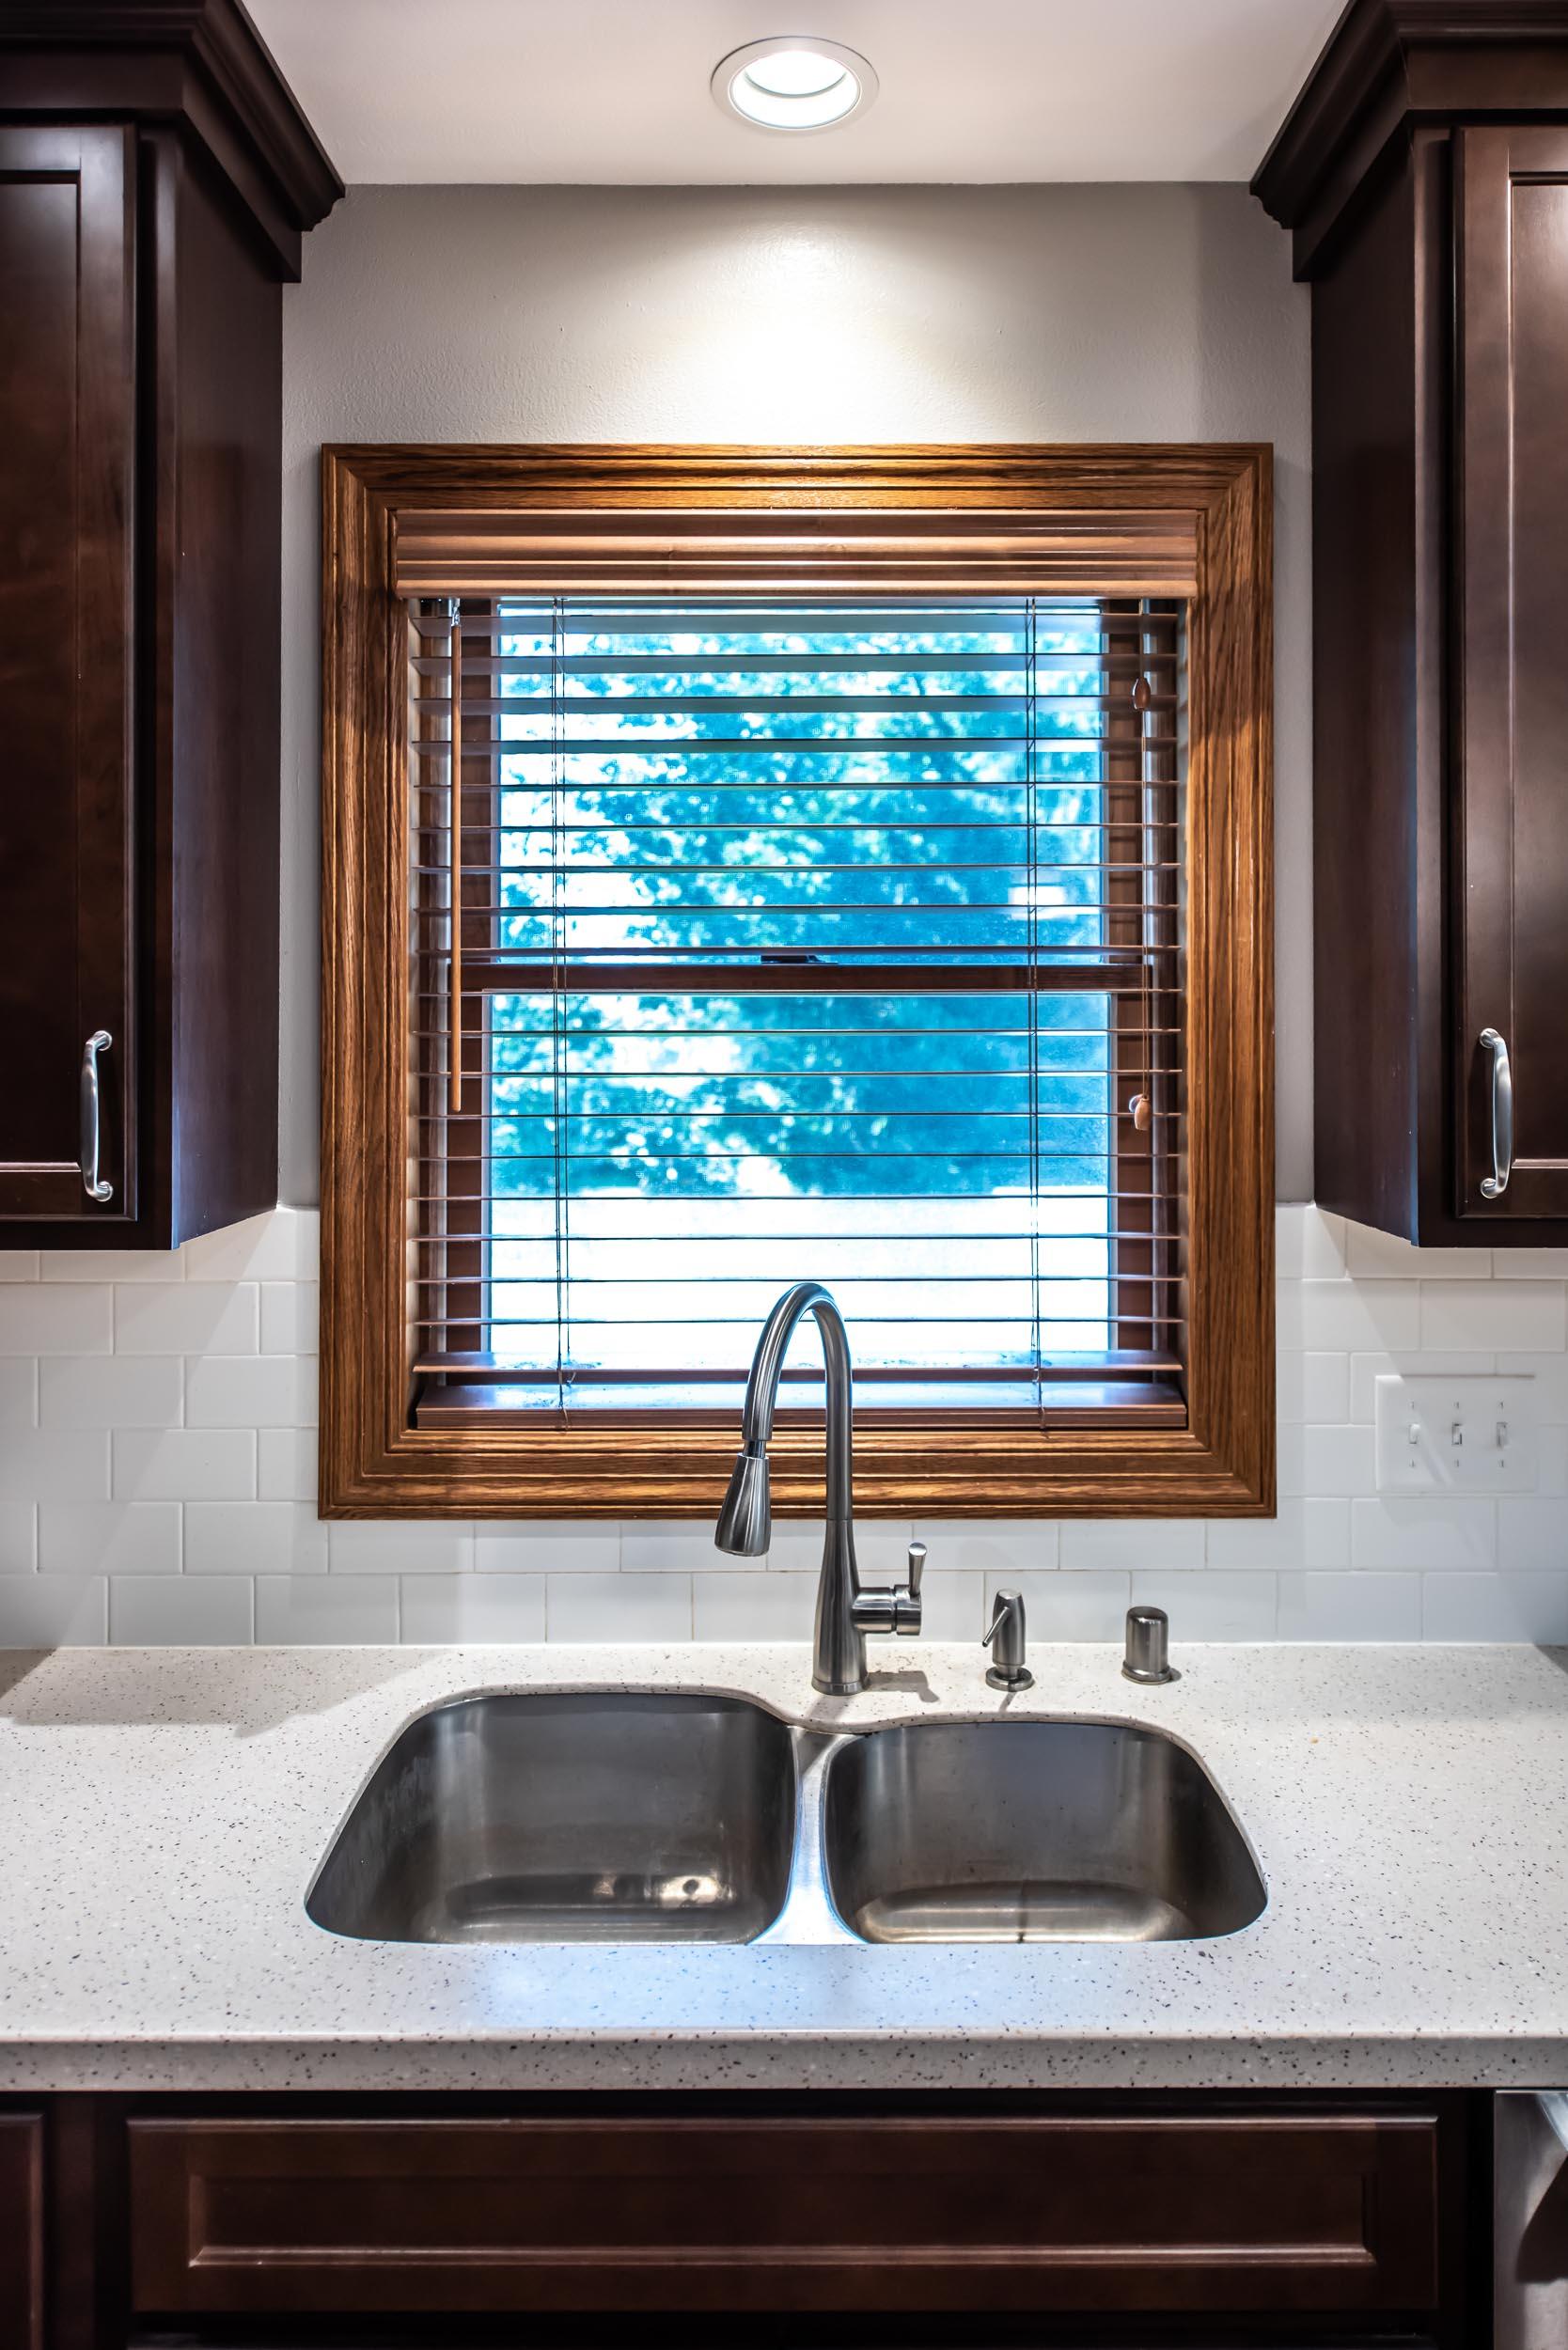 Mirabelle Undermount Double Bowl Stainless Steel Kitchen Sink with Mirabelle Calverton Pull-Down Kitchen Faucet